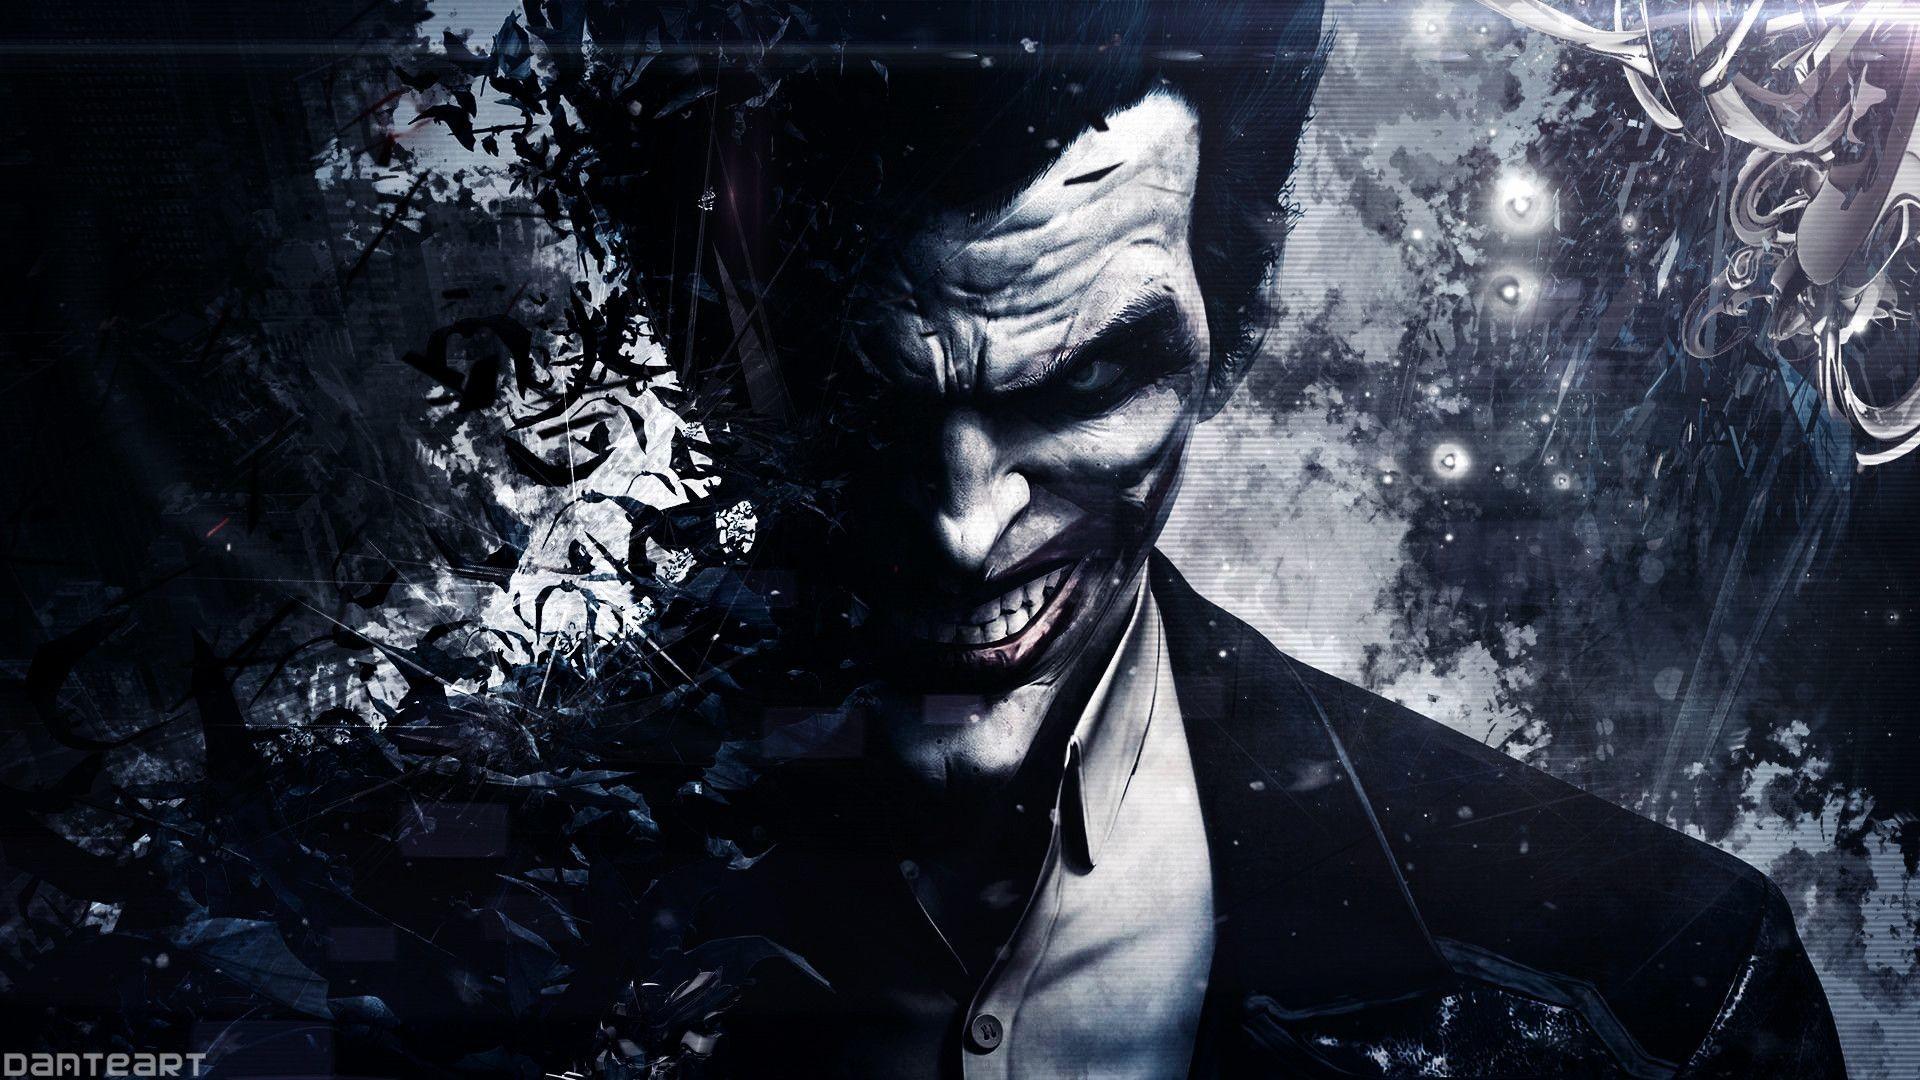 Batman Arkham Origins Joker Wallpaper by DanteArtWallpapers on DeviantArt